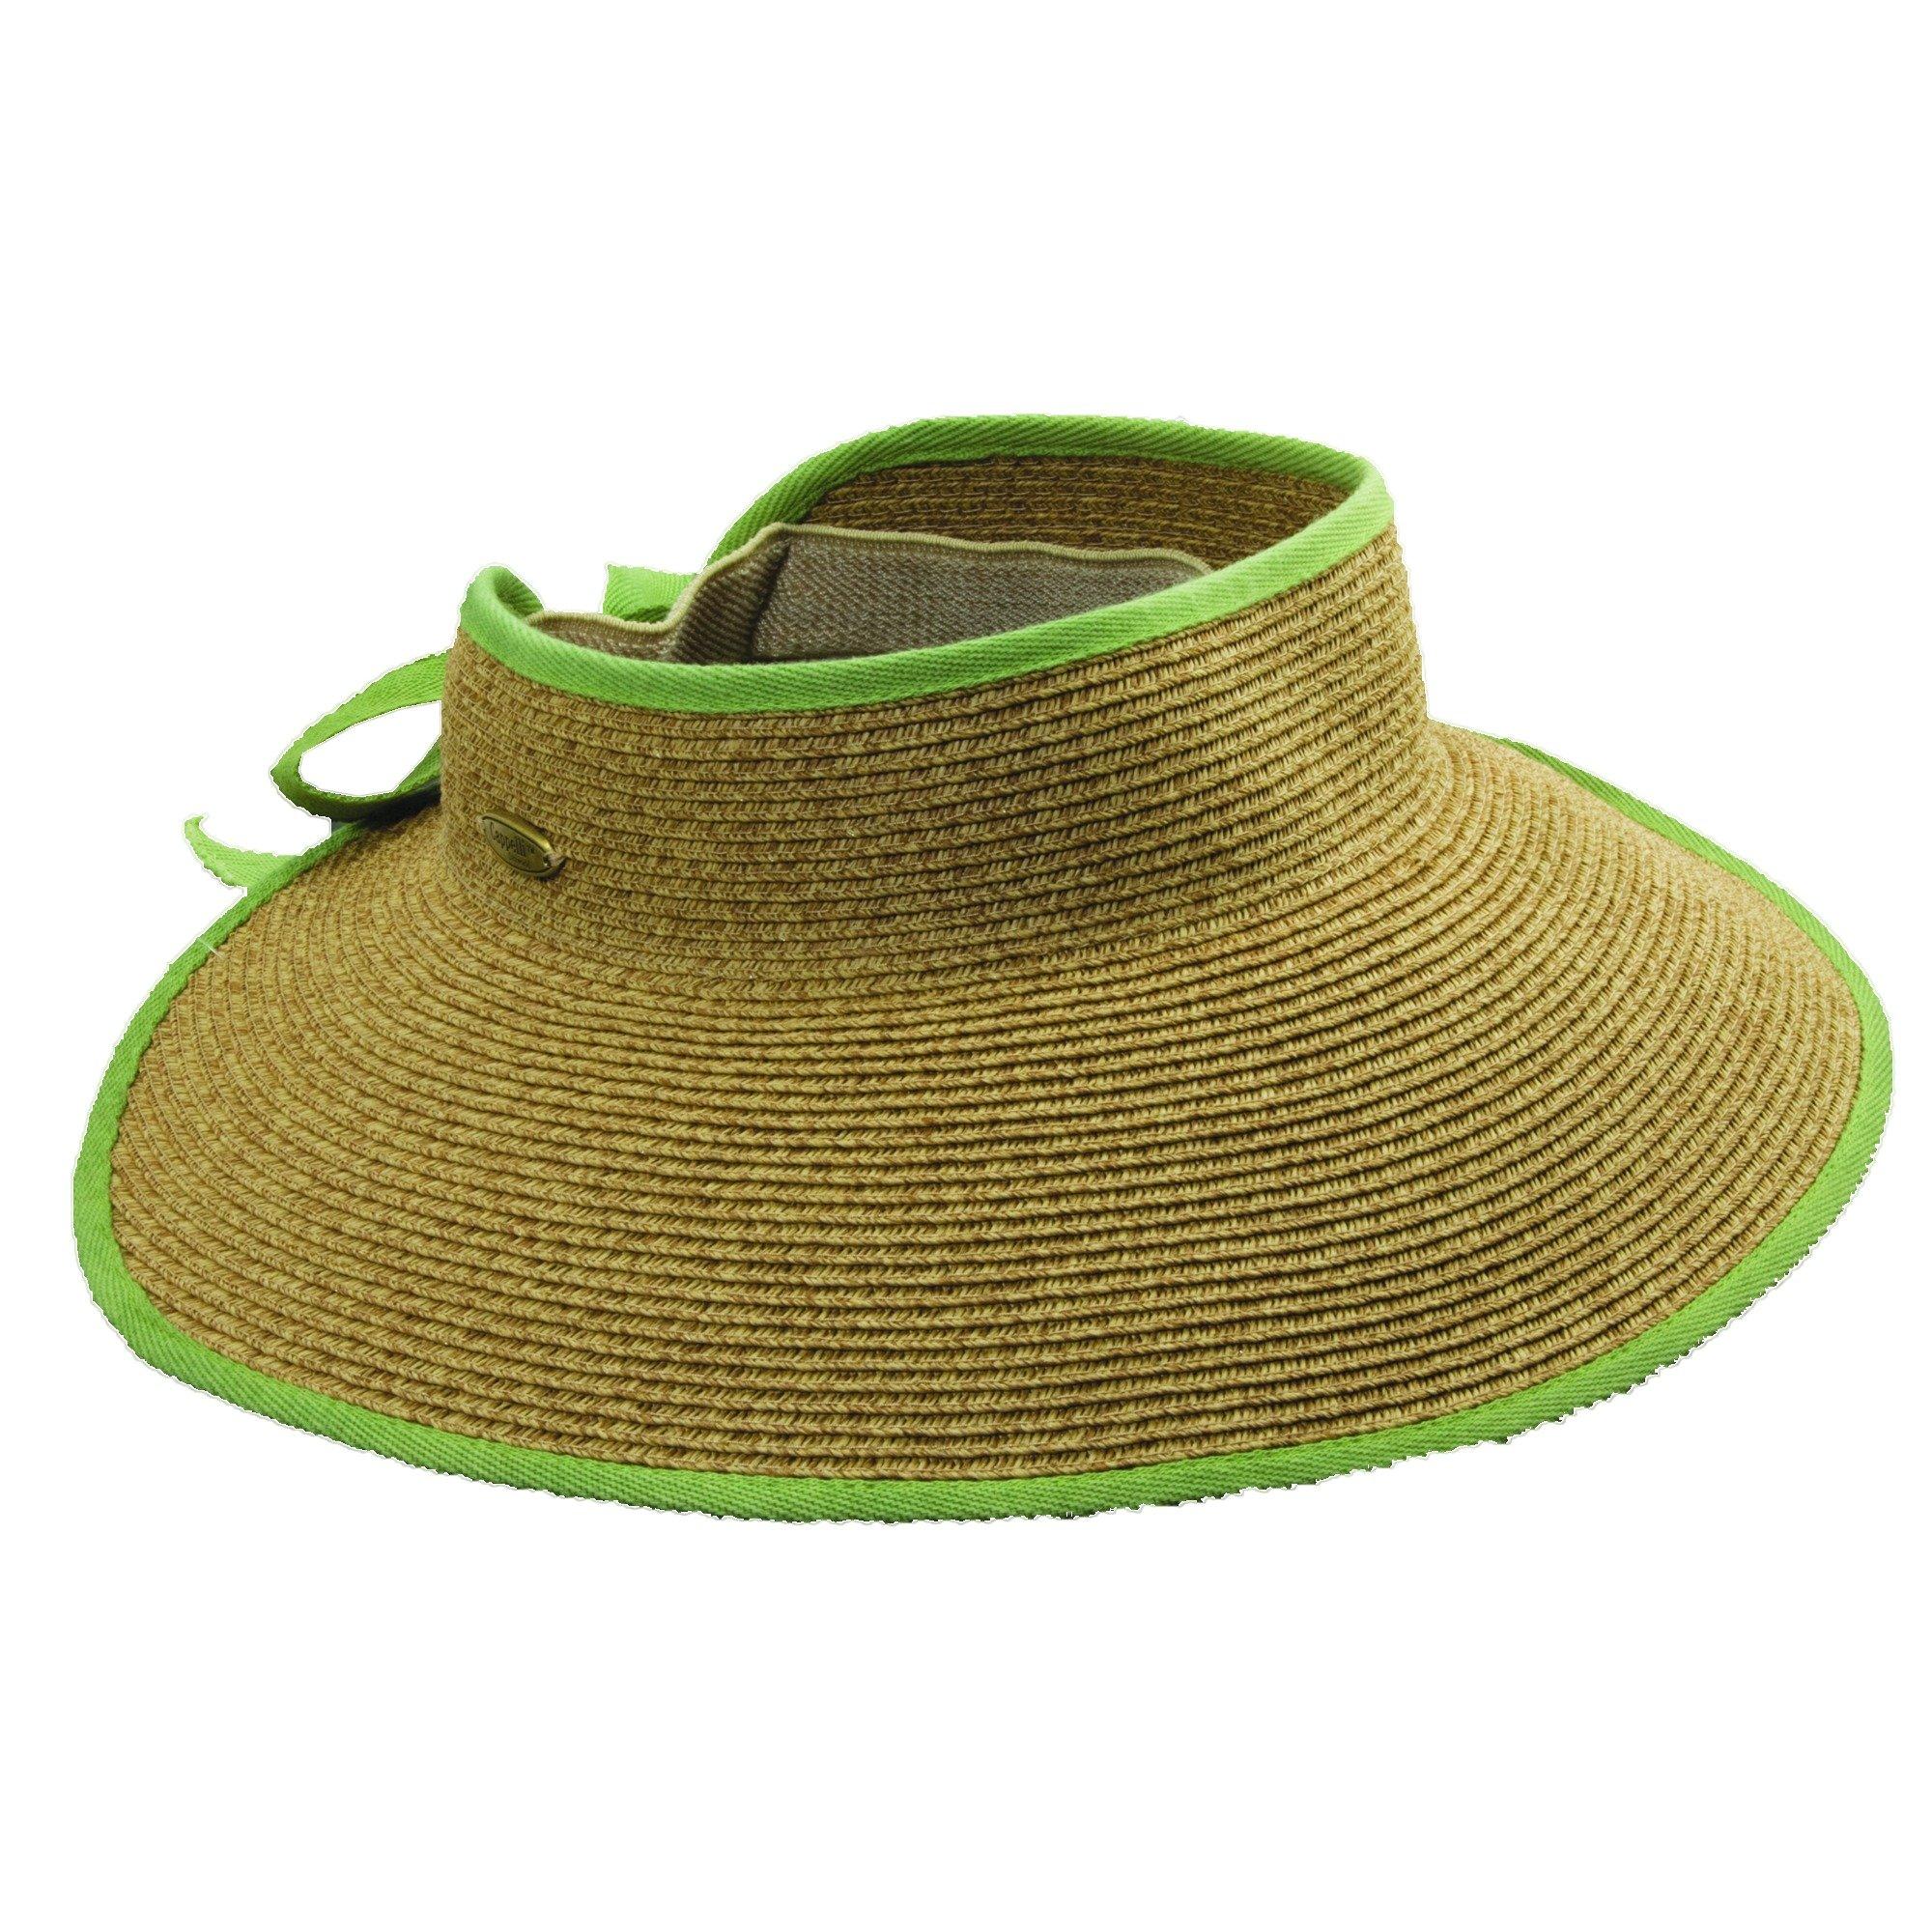 Cappelli Women's Roll-up Wide Brim Sun Visor Hat (Lime)